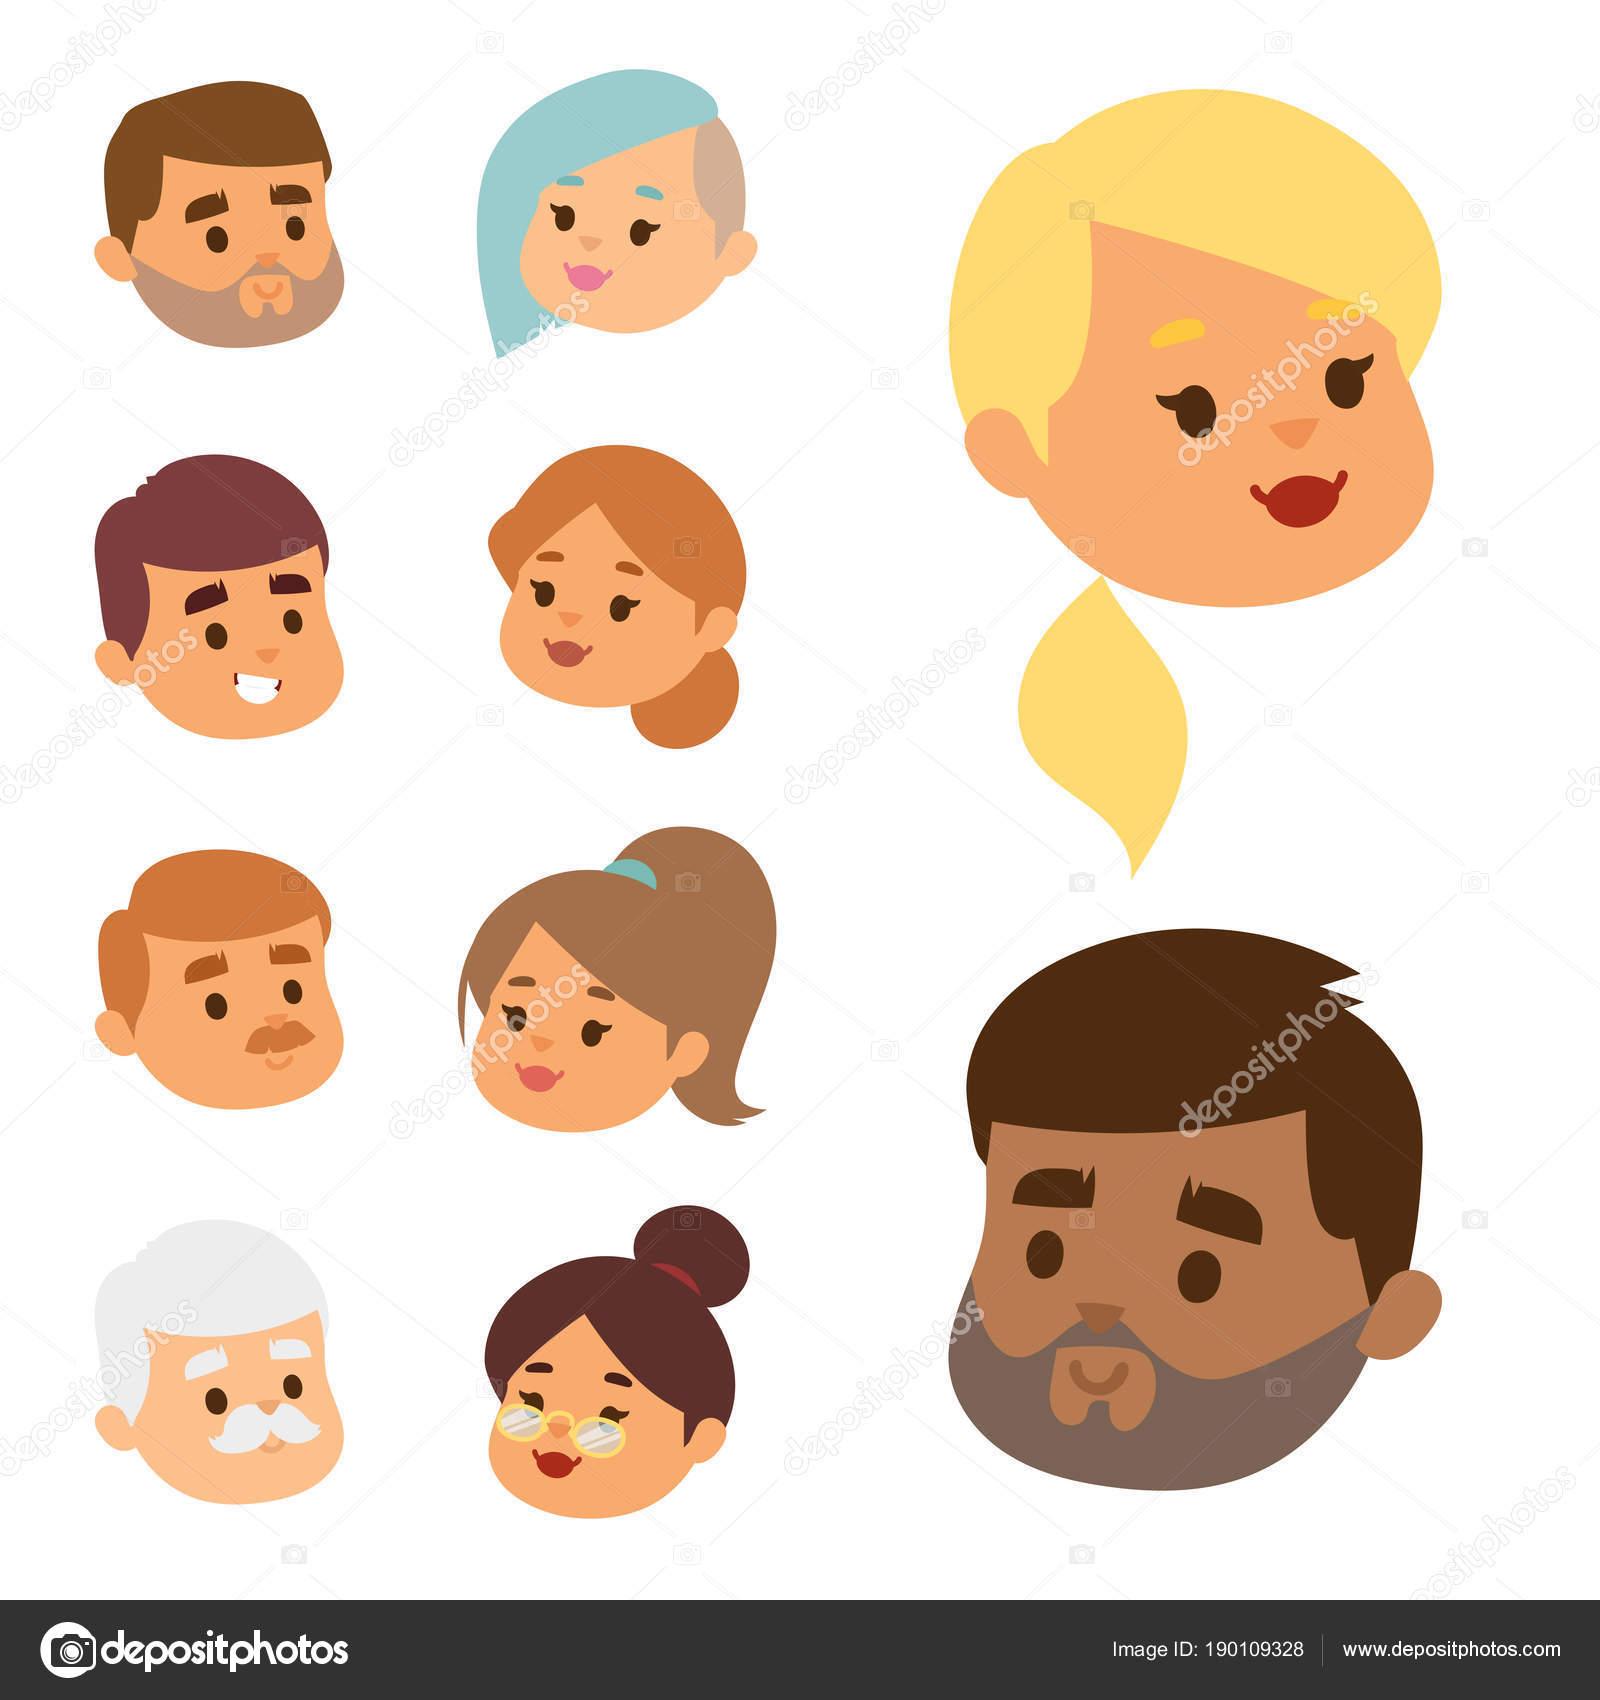 Eemotion Vector People Faces Cartoon Emotions Avatar Illustration